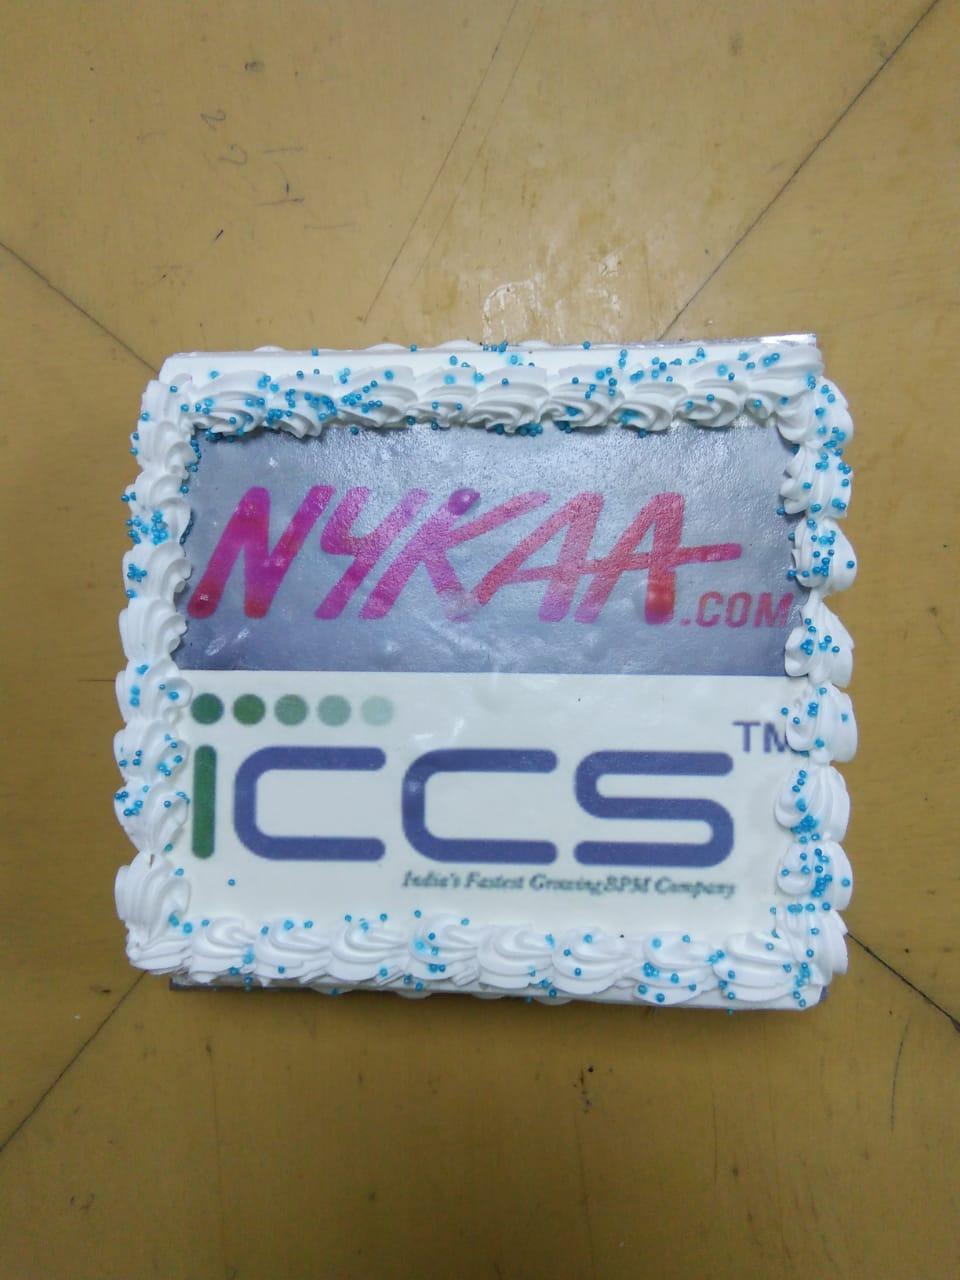 ICCS-BPO Open New Process With NYKAA